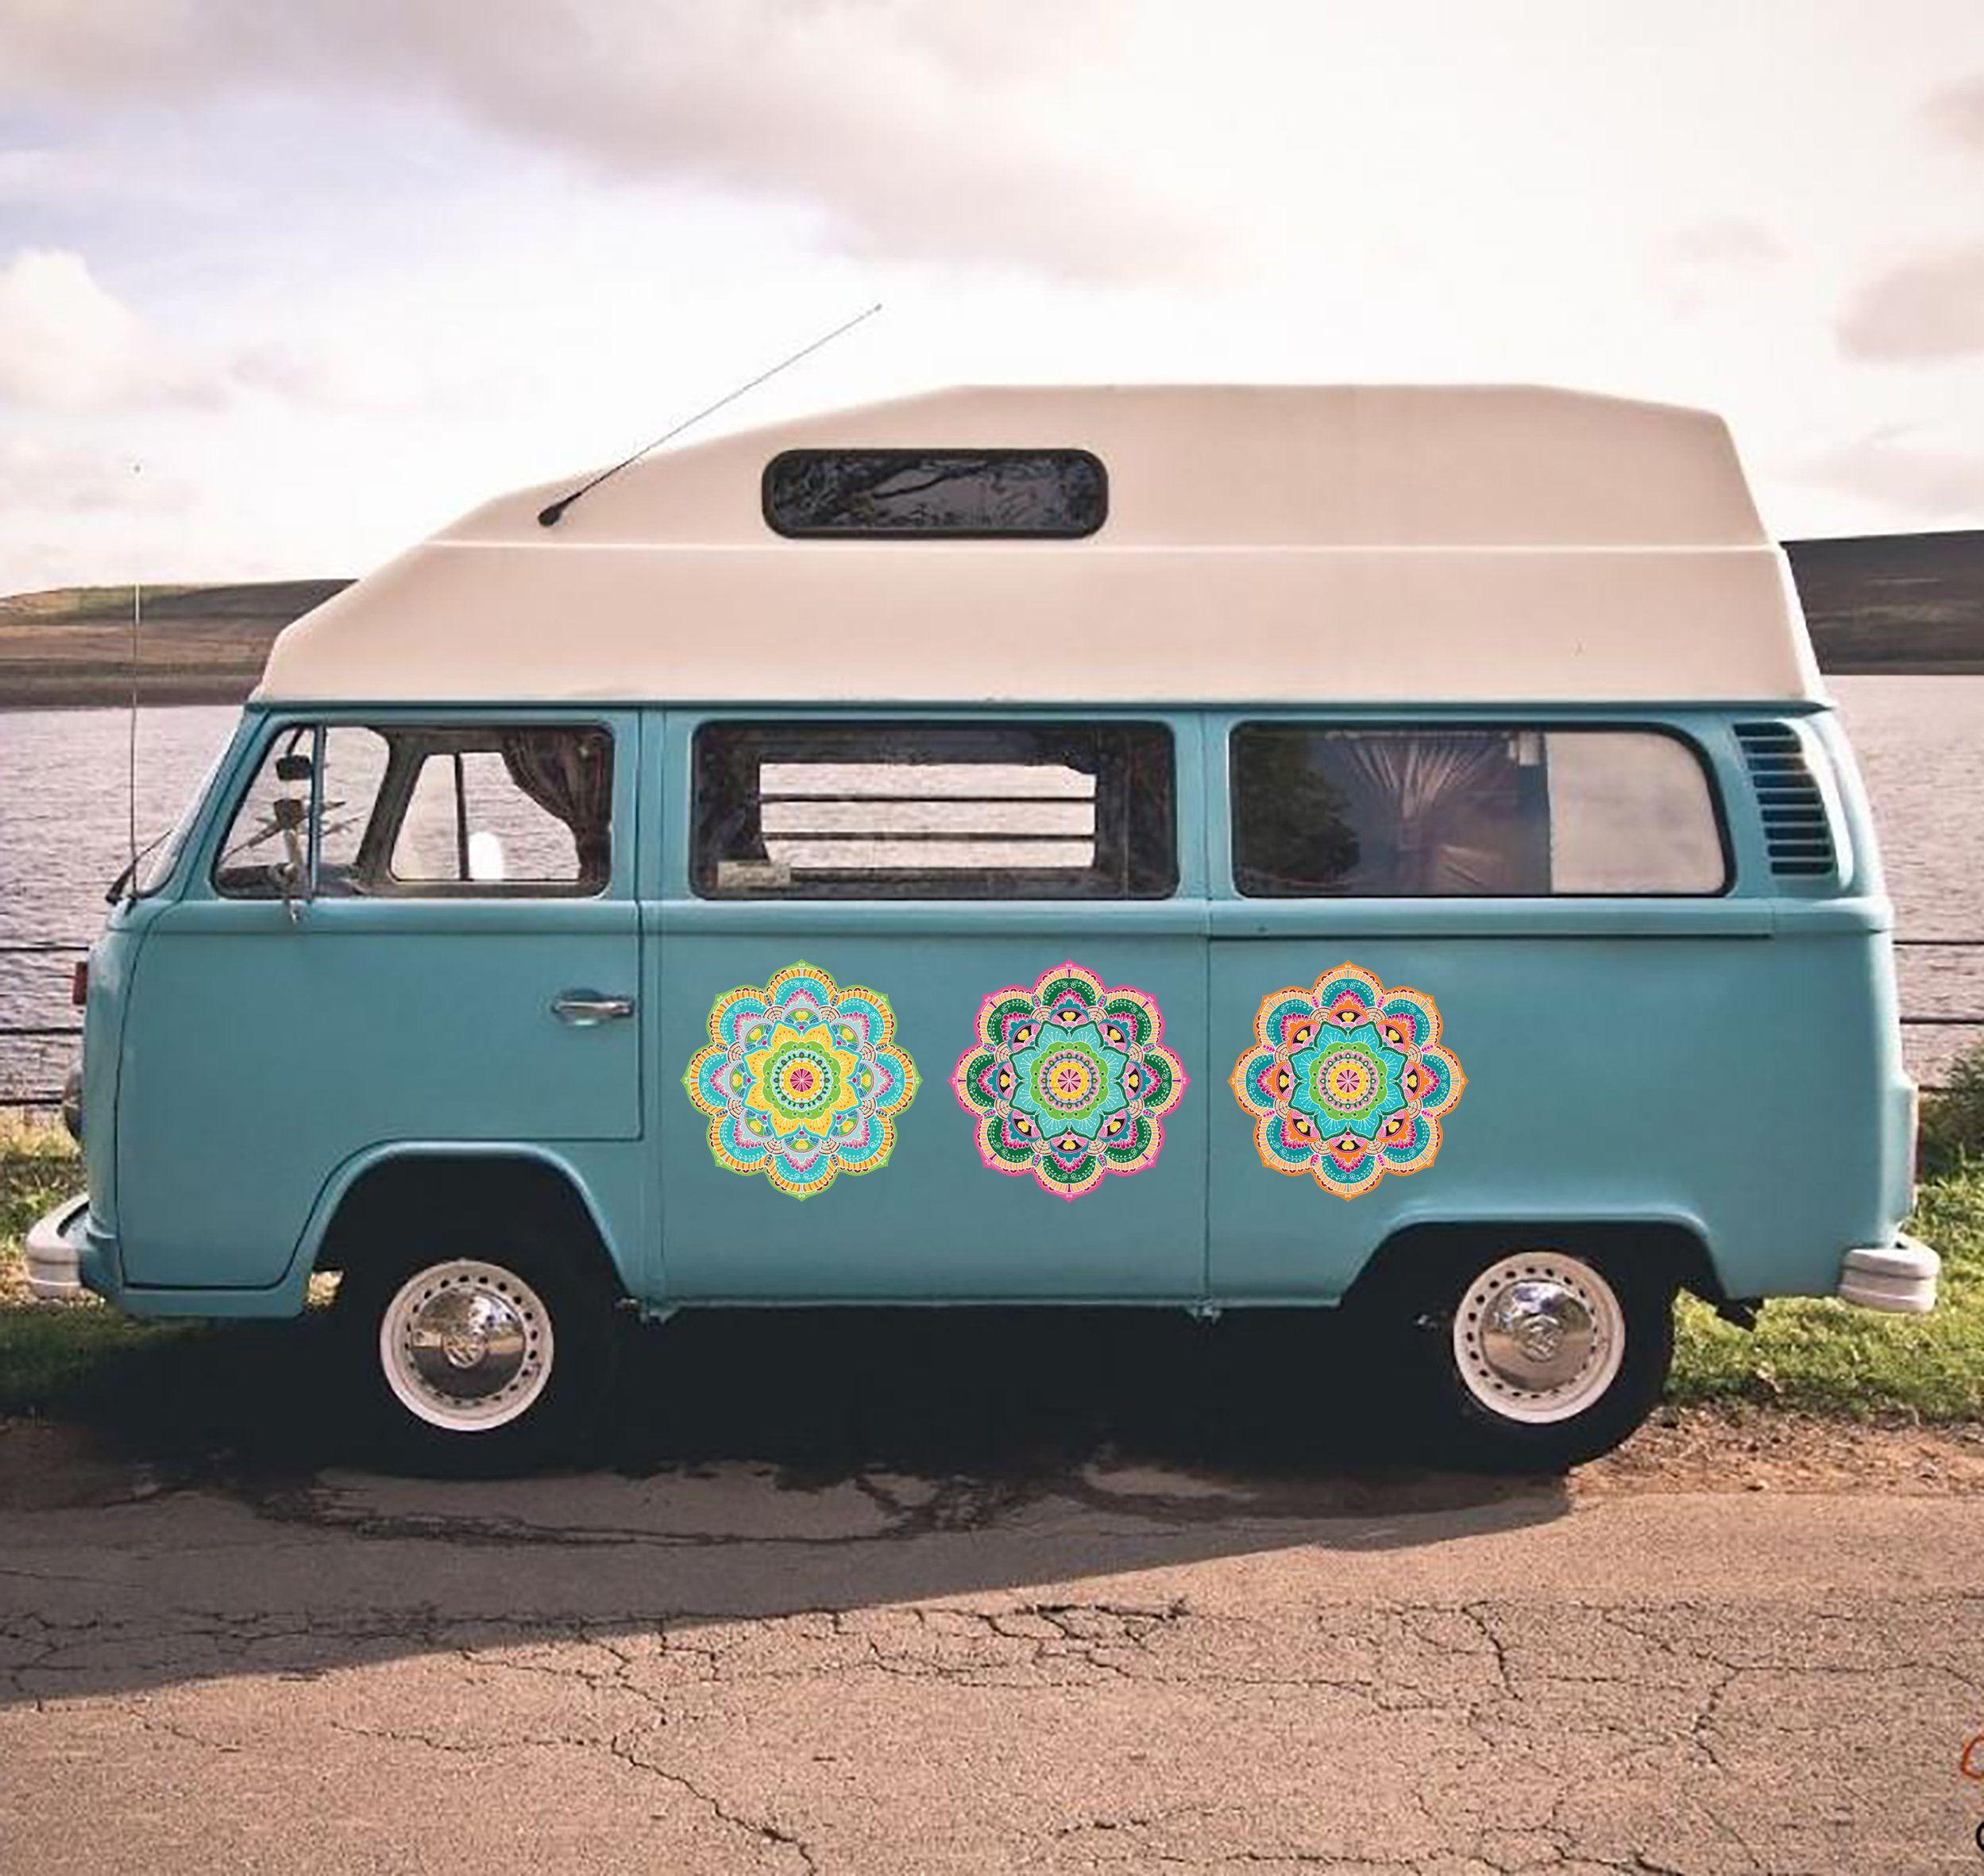 Set Of 3 Mandala Stickers For Camper Trailer Car Outdoor Uv Resistant Vinyl Stickers Mini Van Decorative Decals Gift Camper Travelers Car Decal Hippie Large Wall Decals Vans Stickers [ 2362 x 2498 Pixel ]